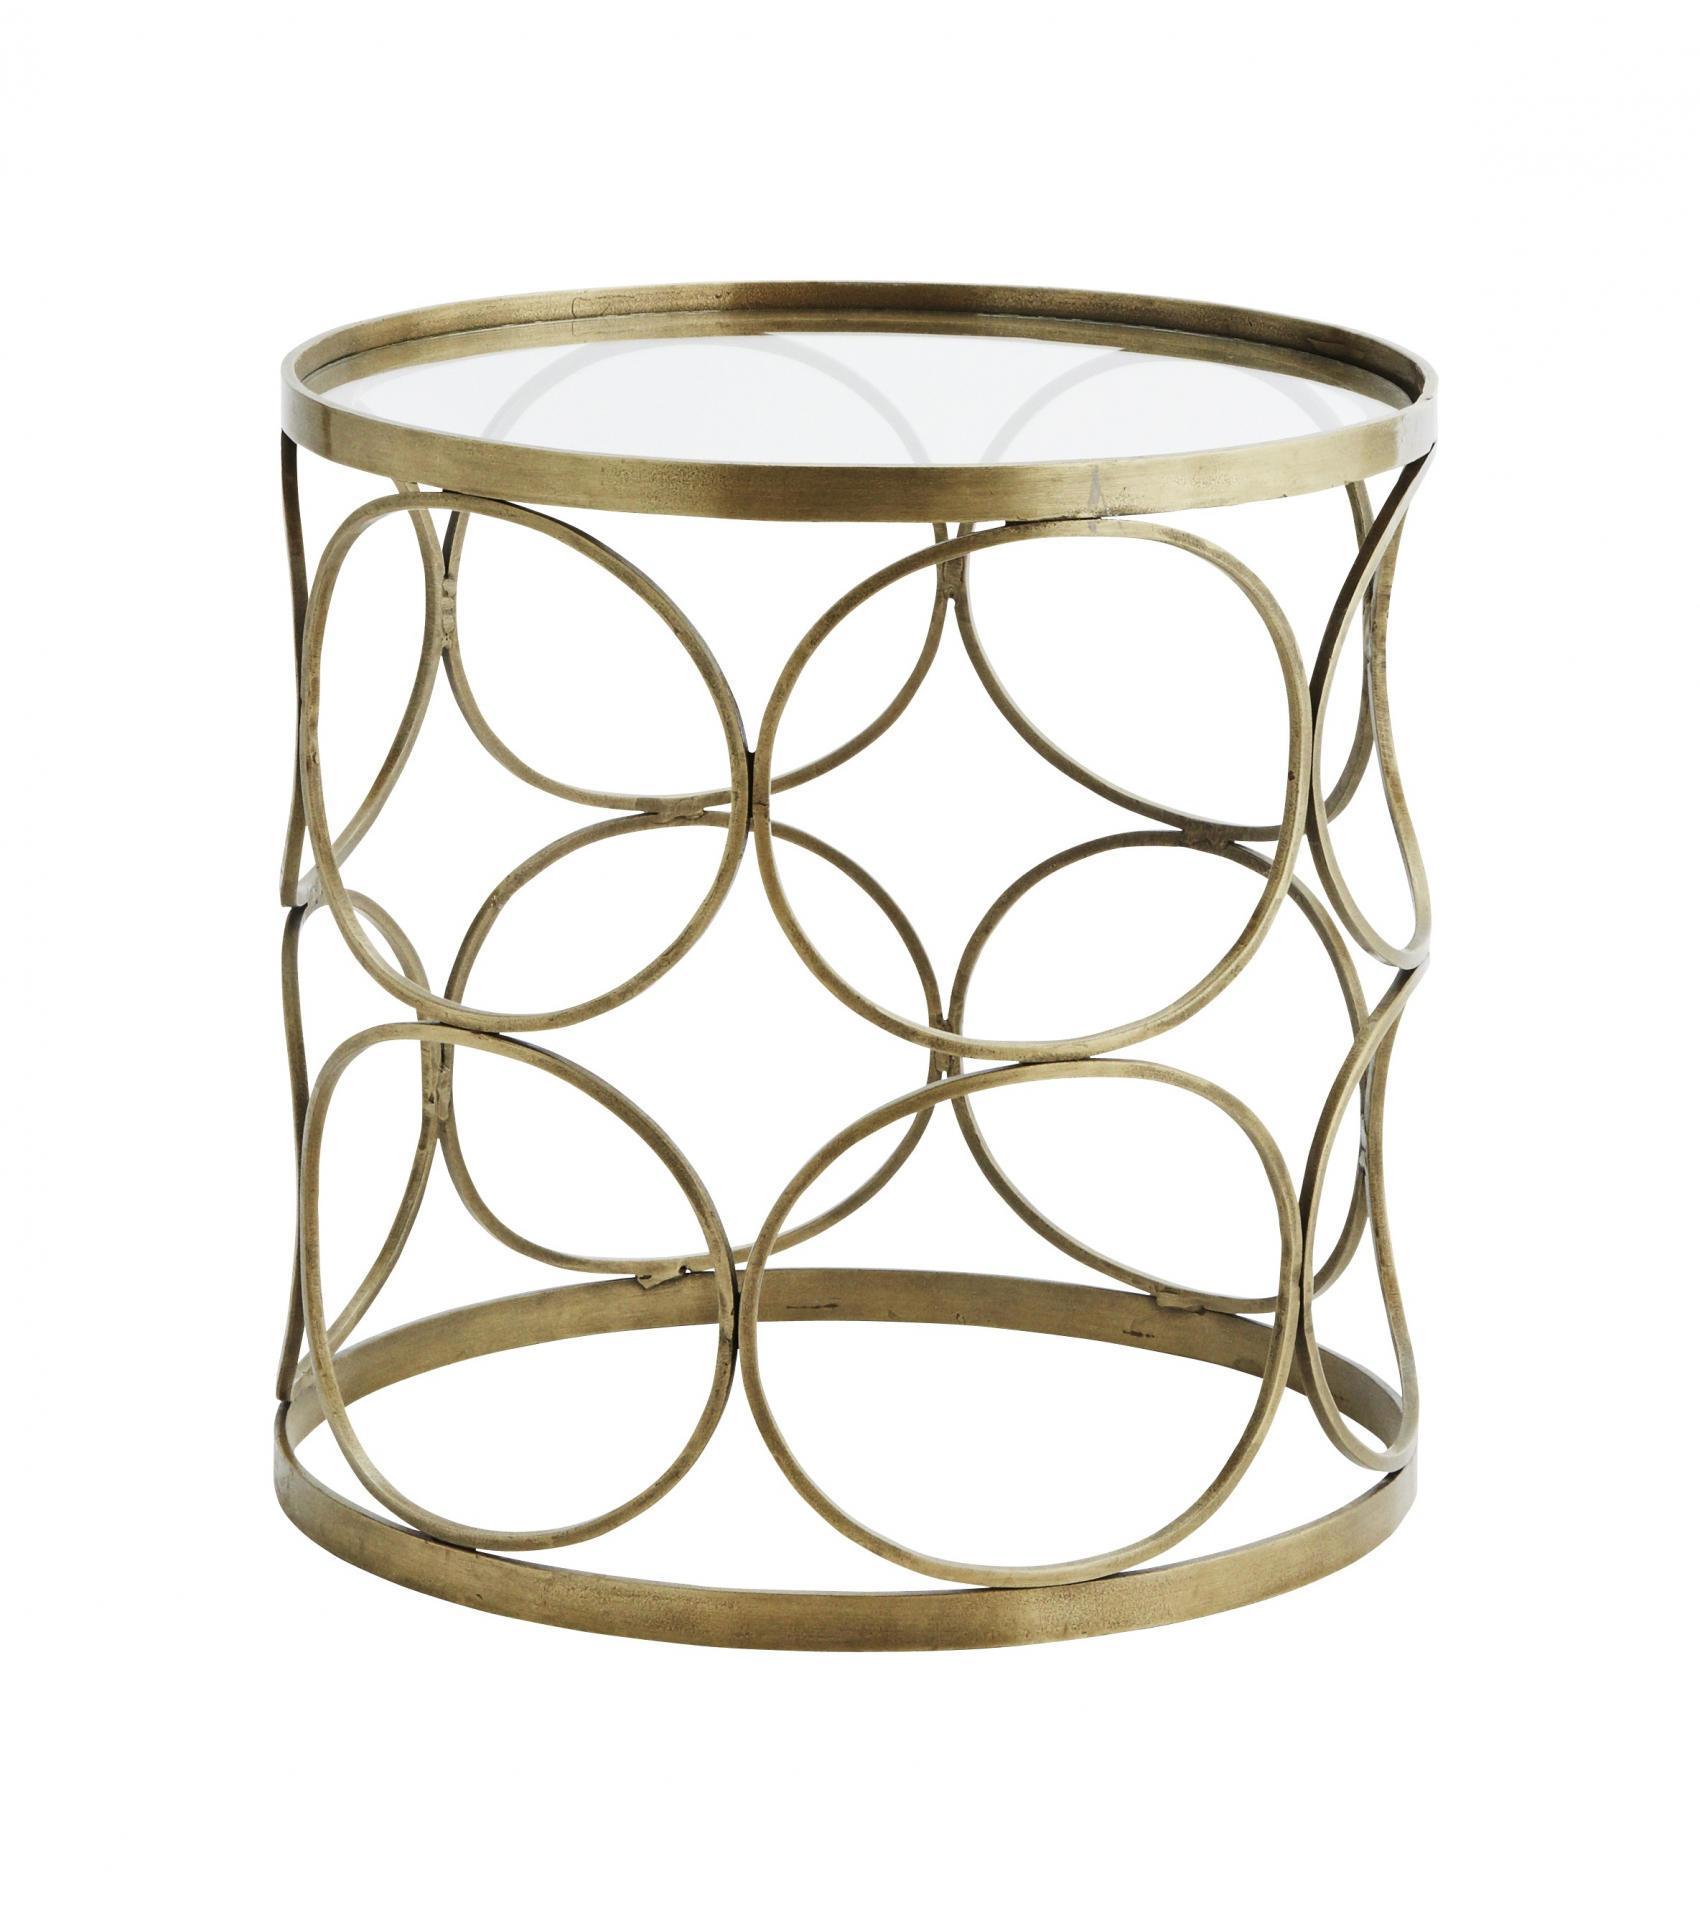 MADAM STOLTZ Odkládací stolek Circle Brass, zlatá barva, sklo, kov